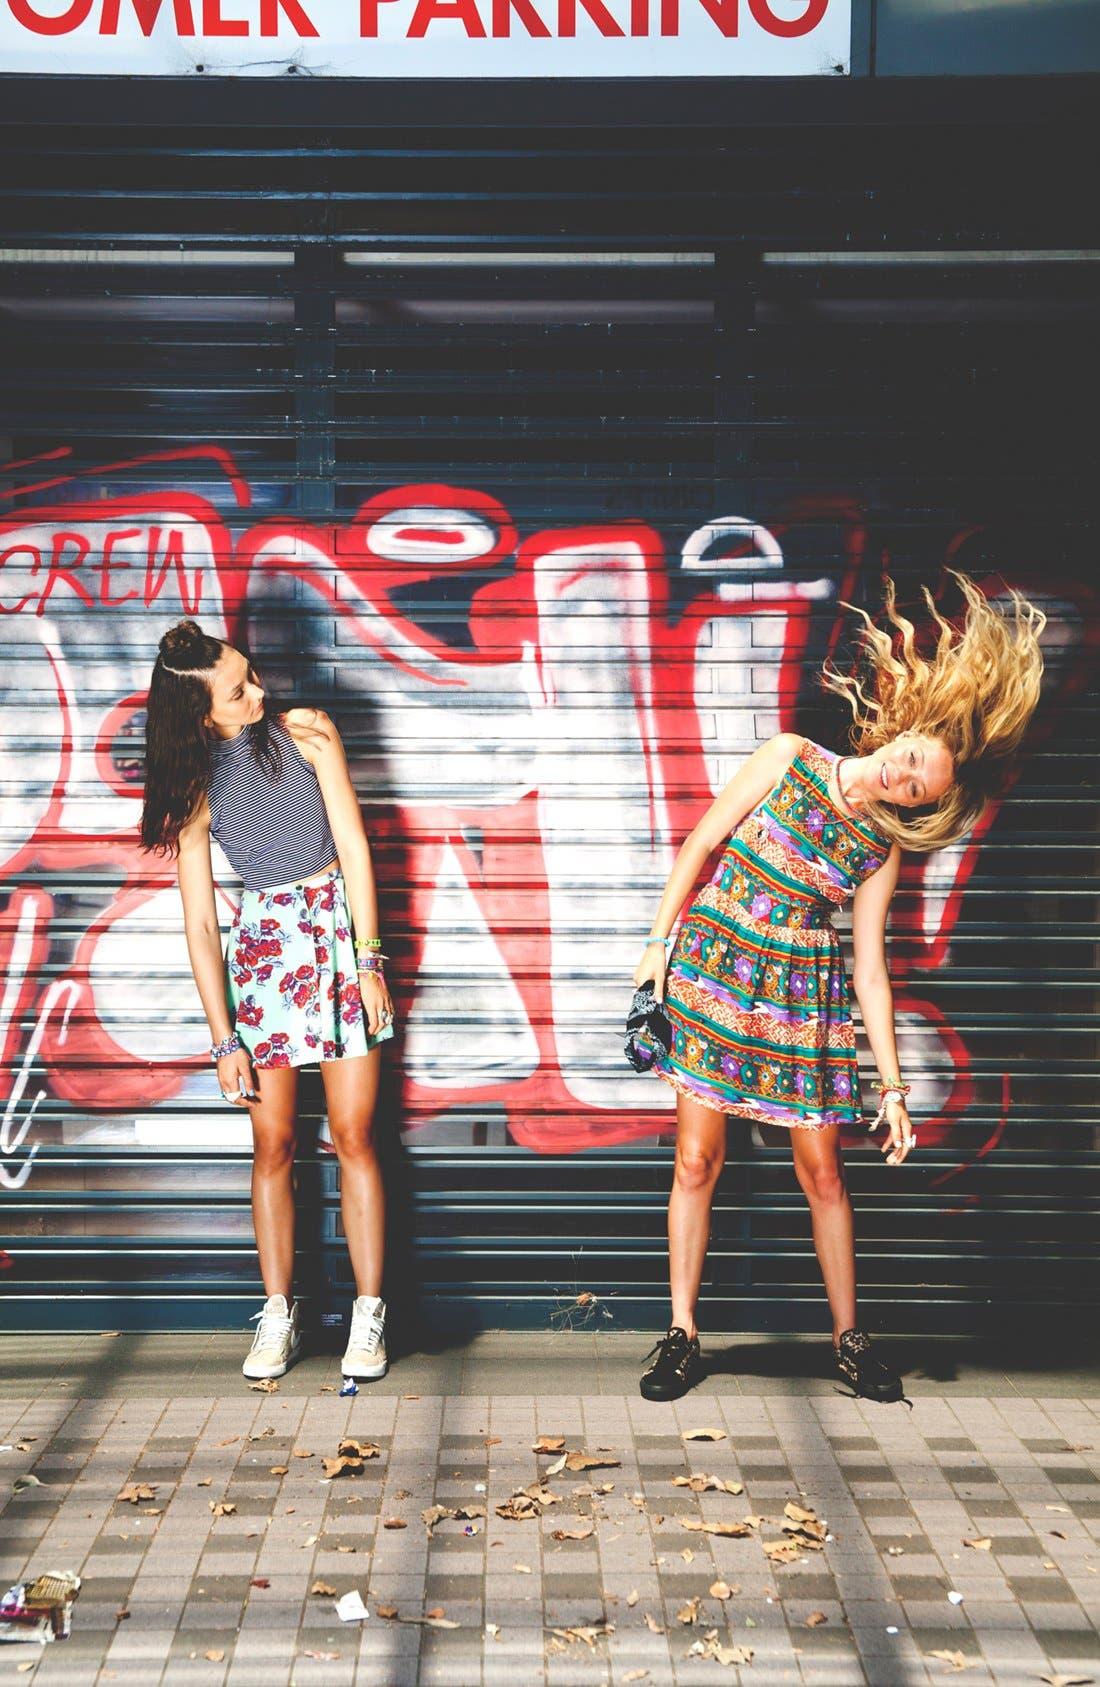 Alternate Image 1 Selected - MINKPINK 'Woodstock' Dress, Crop Top & High Waist Skater Skirt